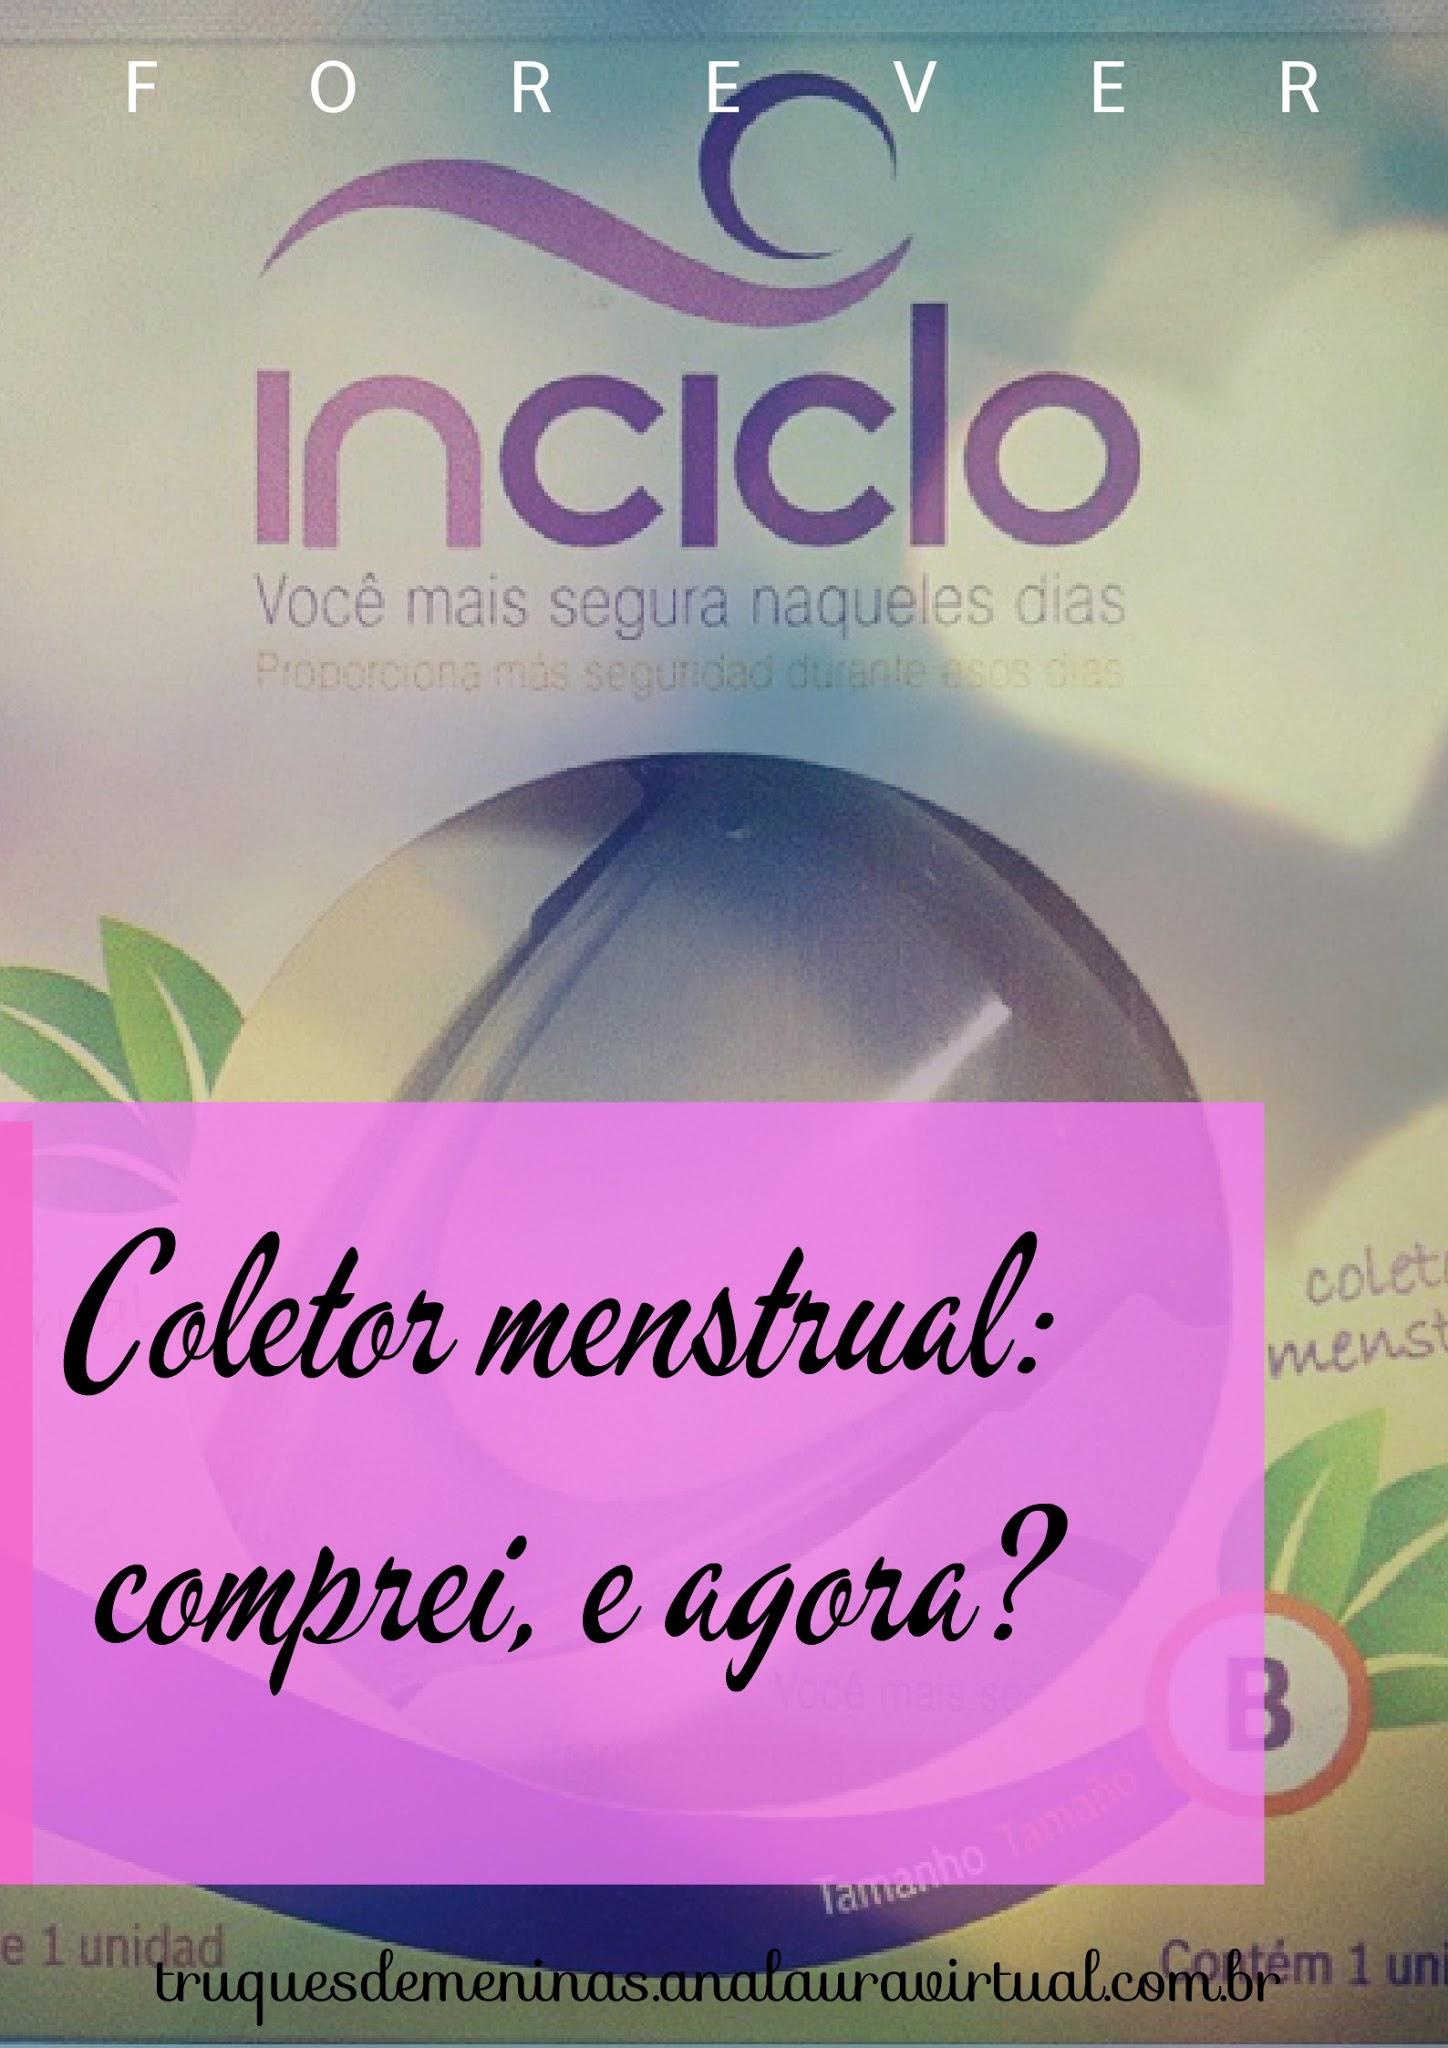 coletor menstrual inciclo